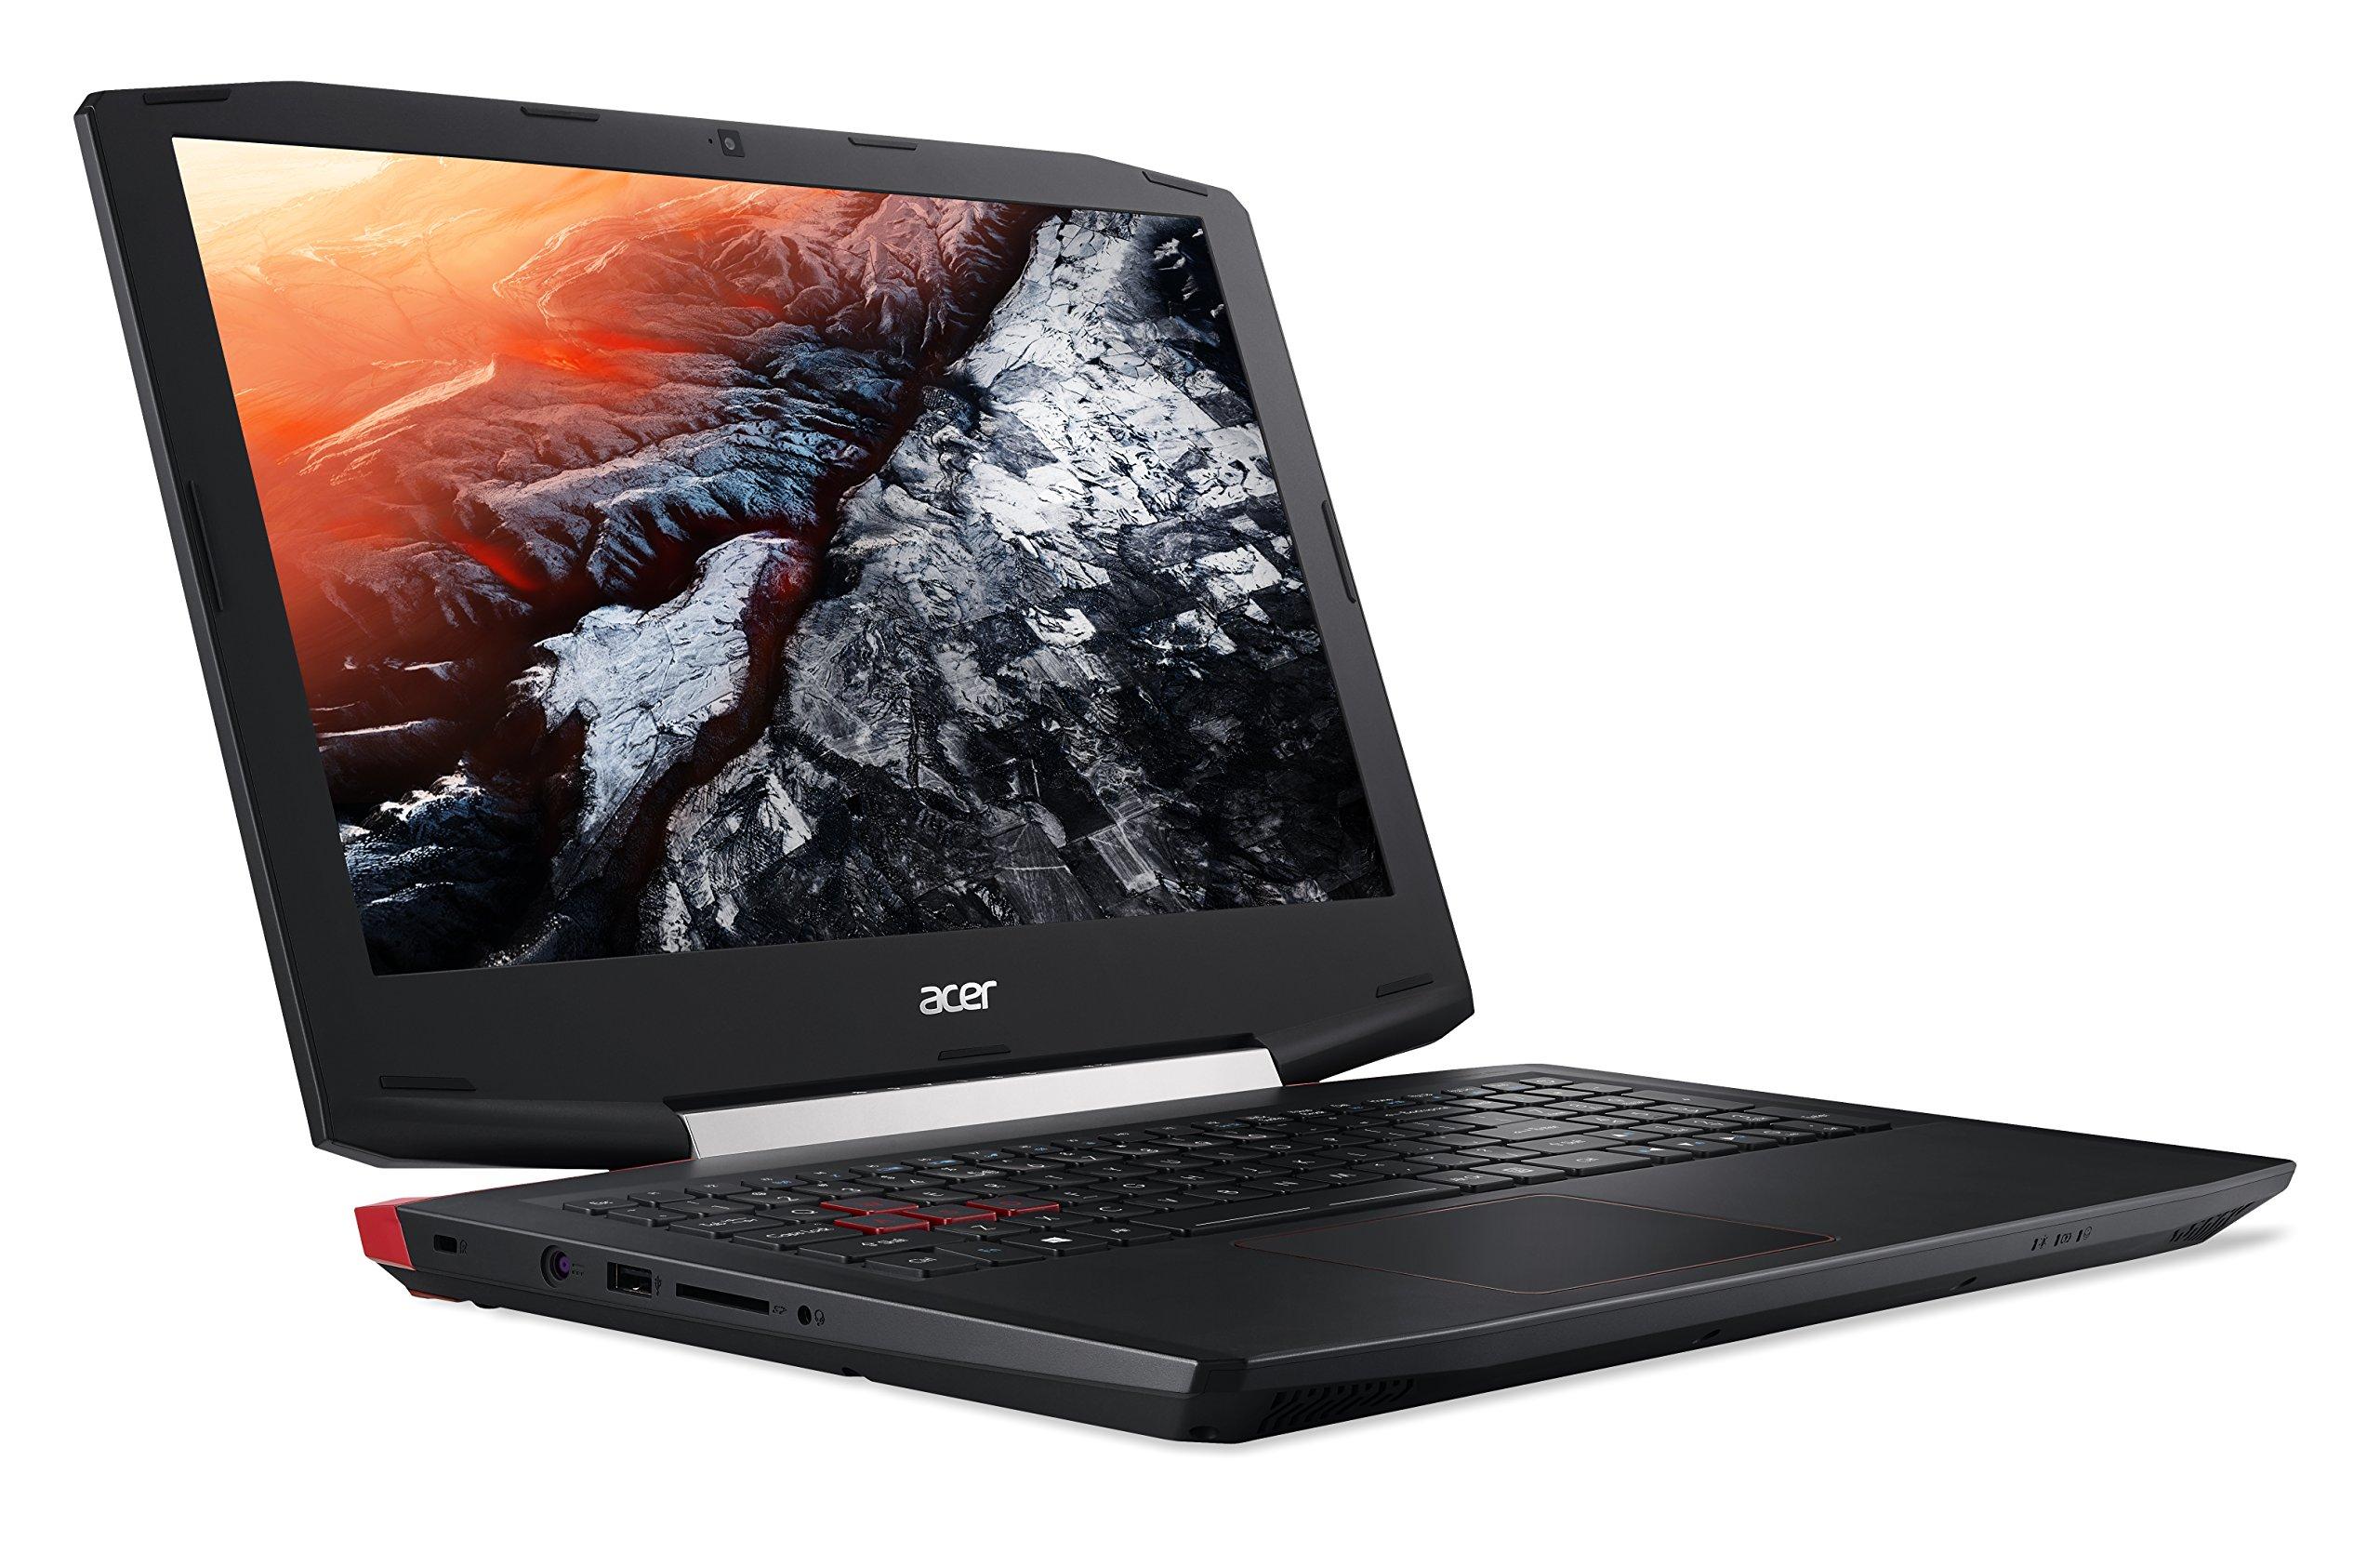 Acer Aspire VX 15 Gaming Laptop, 7th Gen Intel Core i7, NVIDIA GeForce GTX 1050 Ti, 15.6 Full HD, 16GB DDR4, 256GB SSD, VX5-591G-75RM by Acer (Image #3)